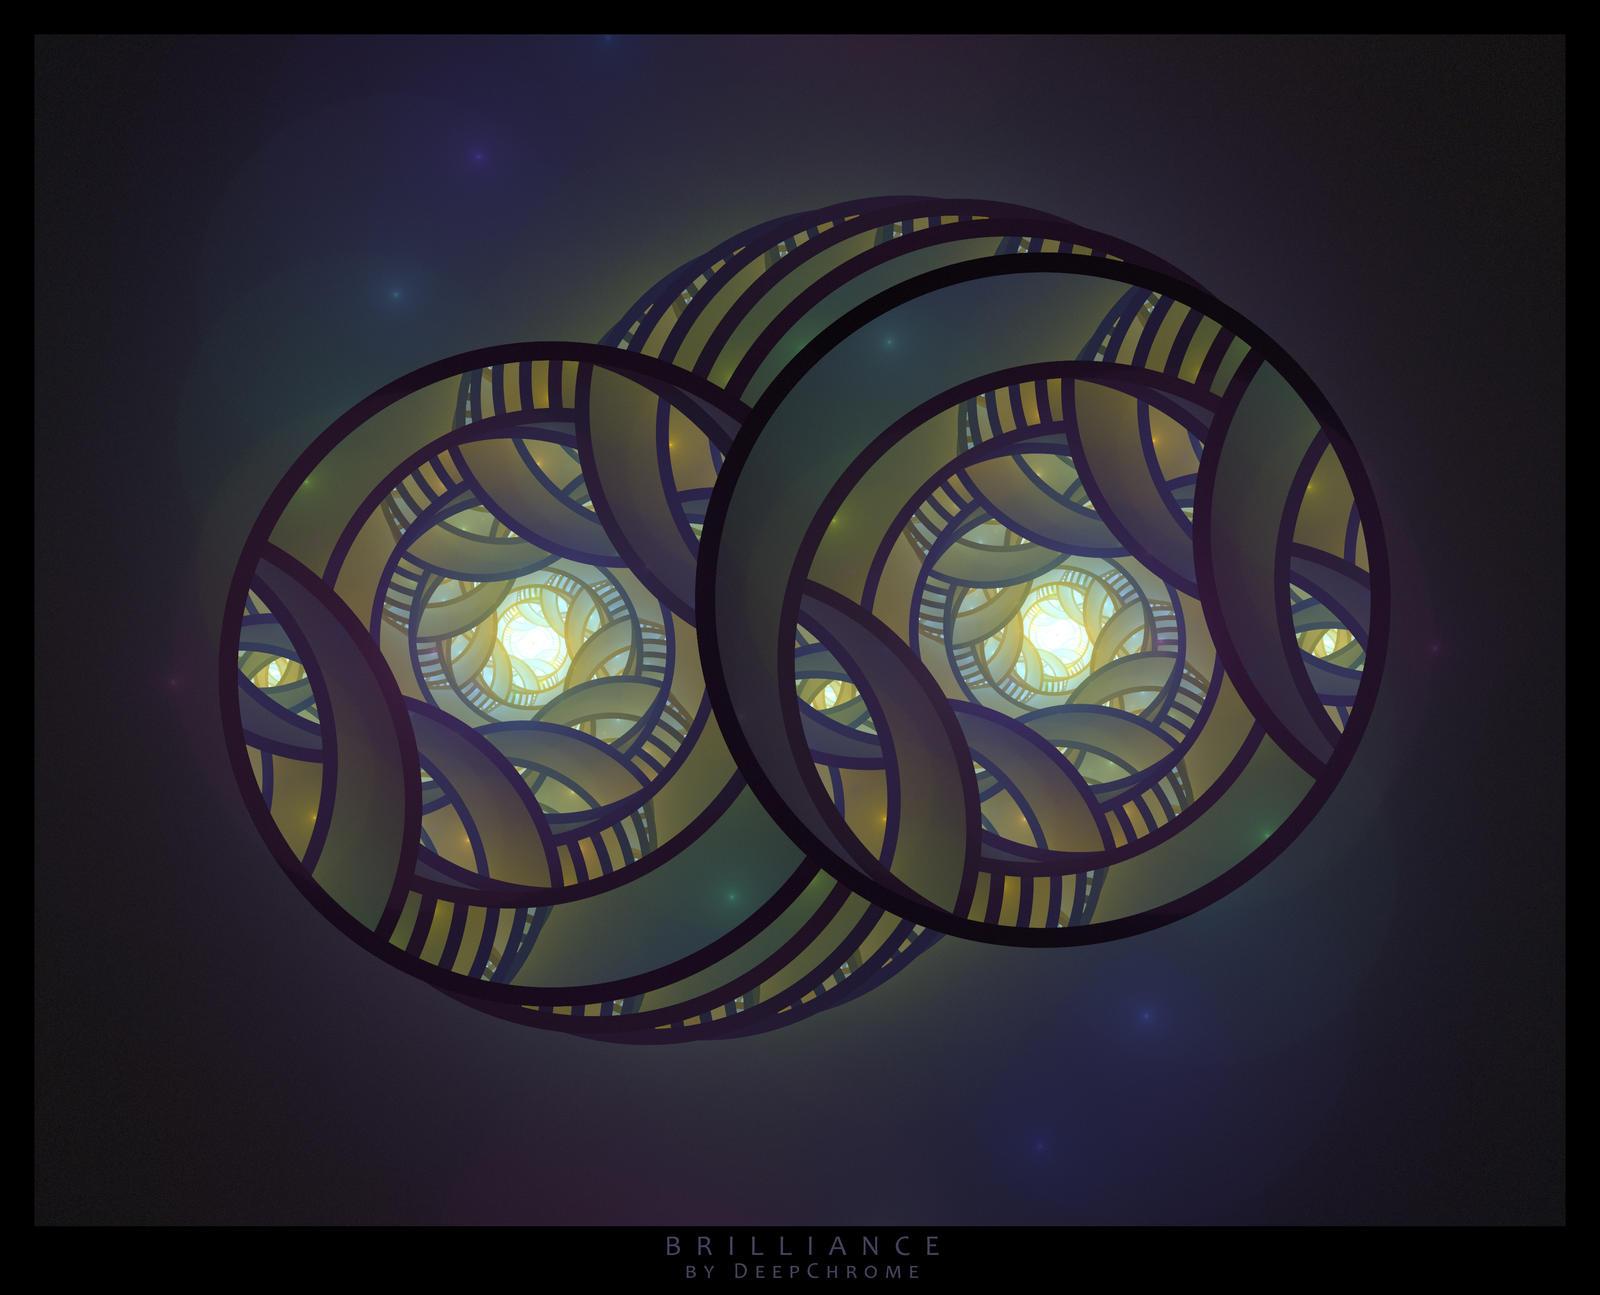 BRILLIANCE by DeepChrome